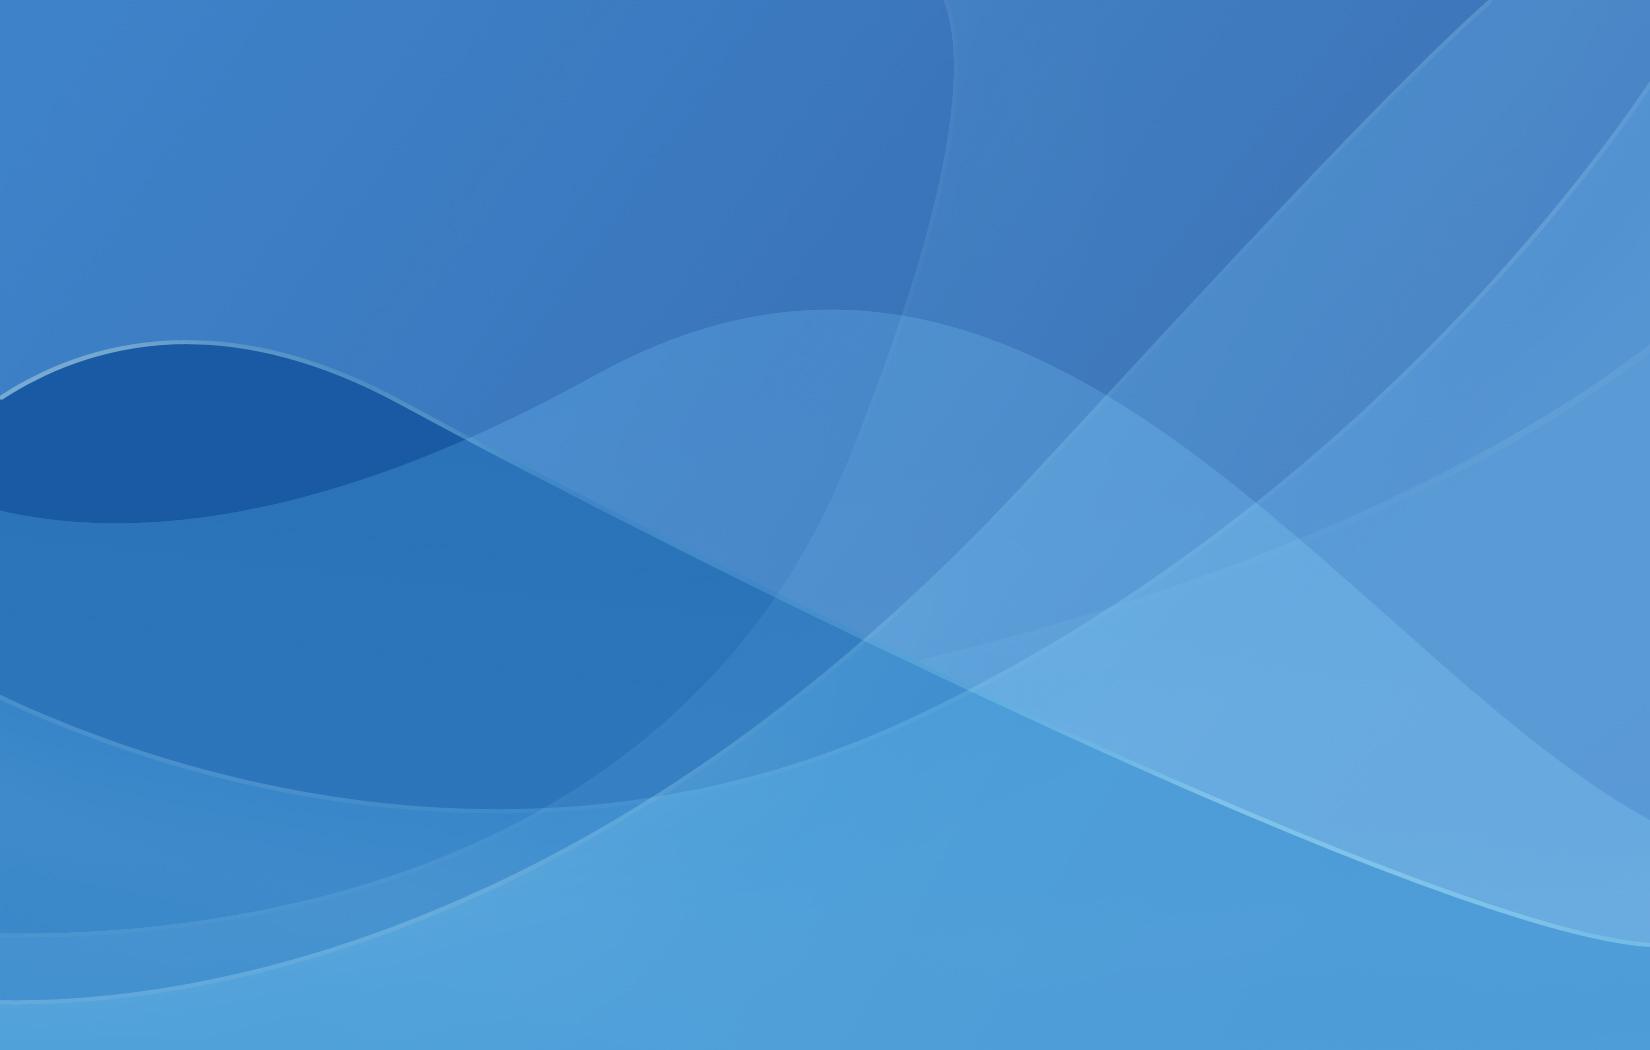 Mac OS X style wallpaper by Snowpilot on DeviantArt